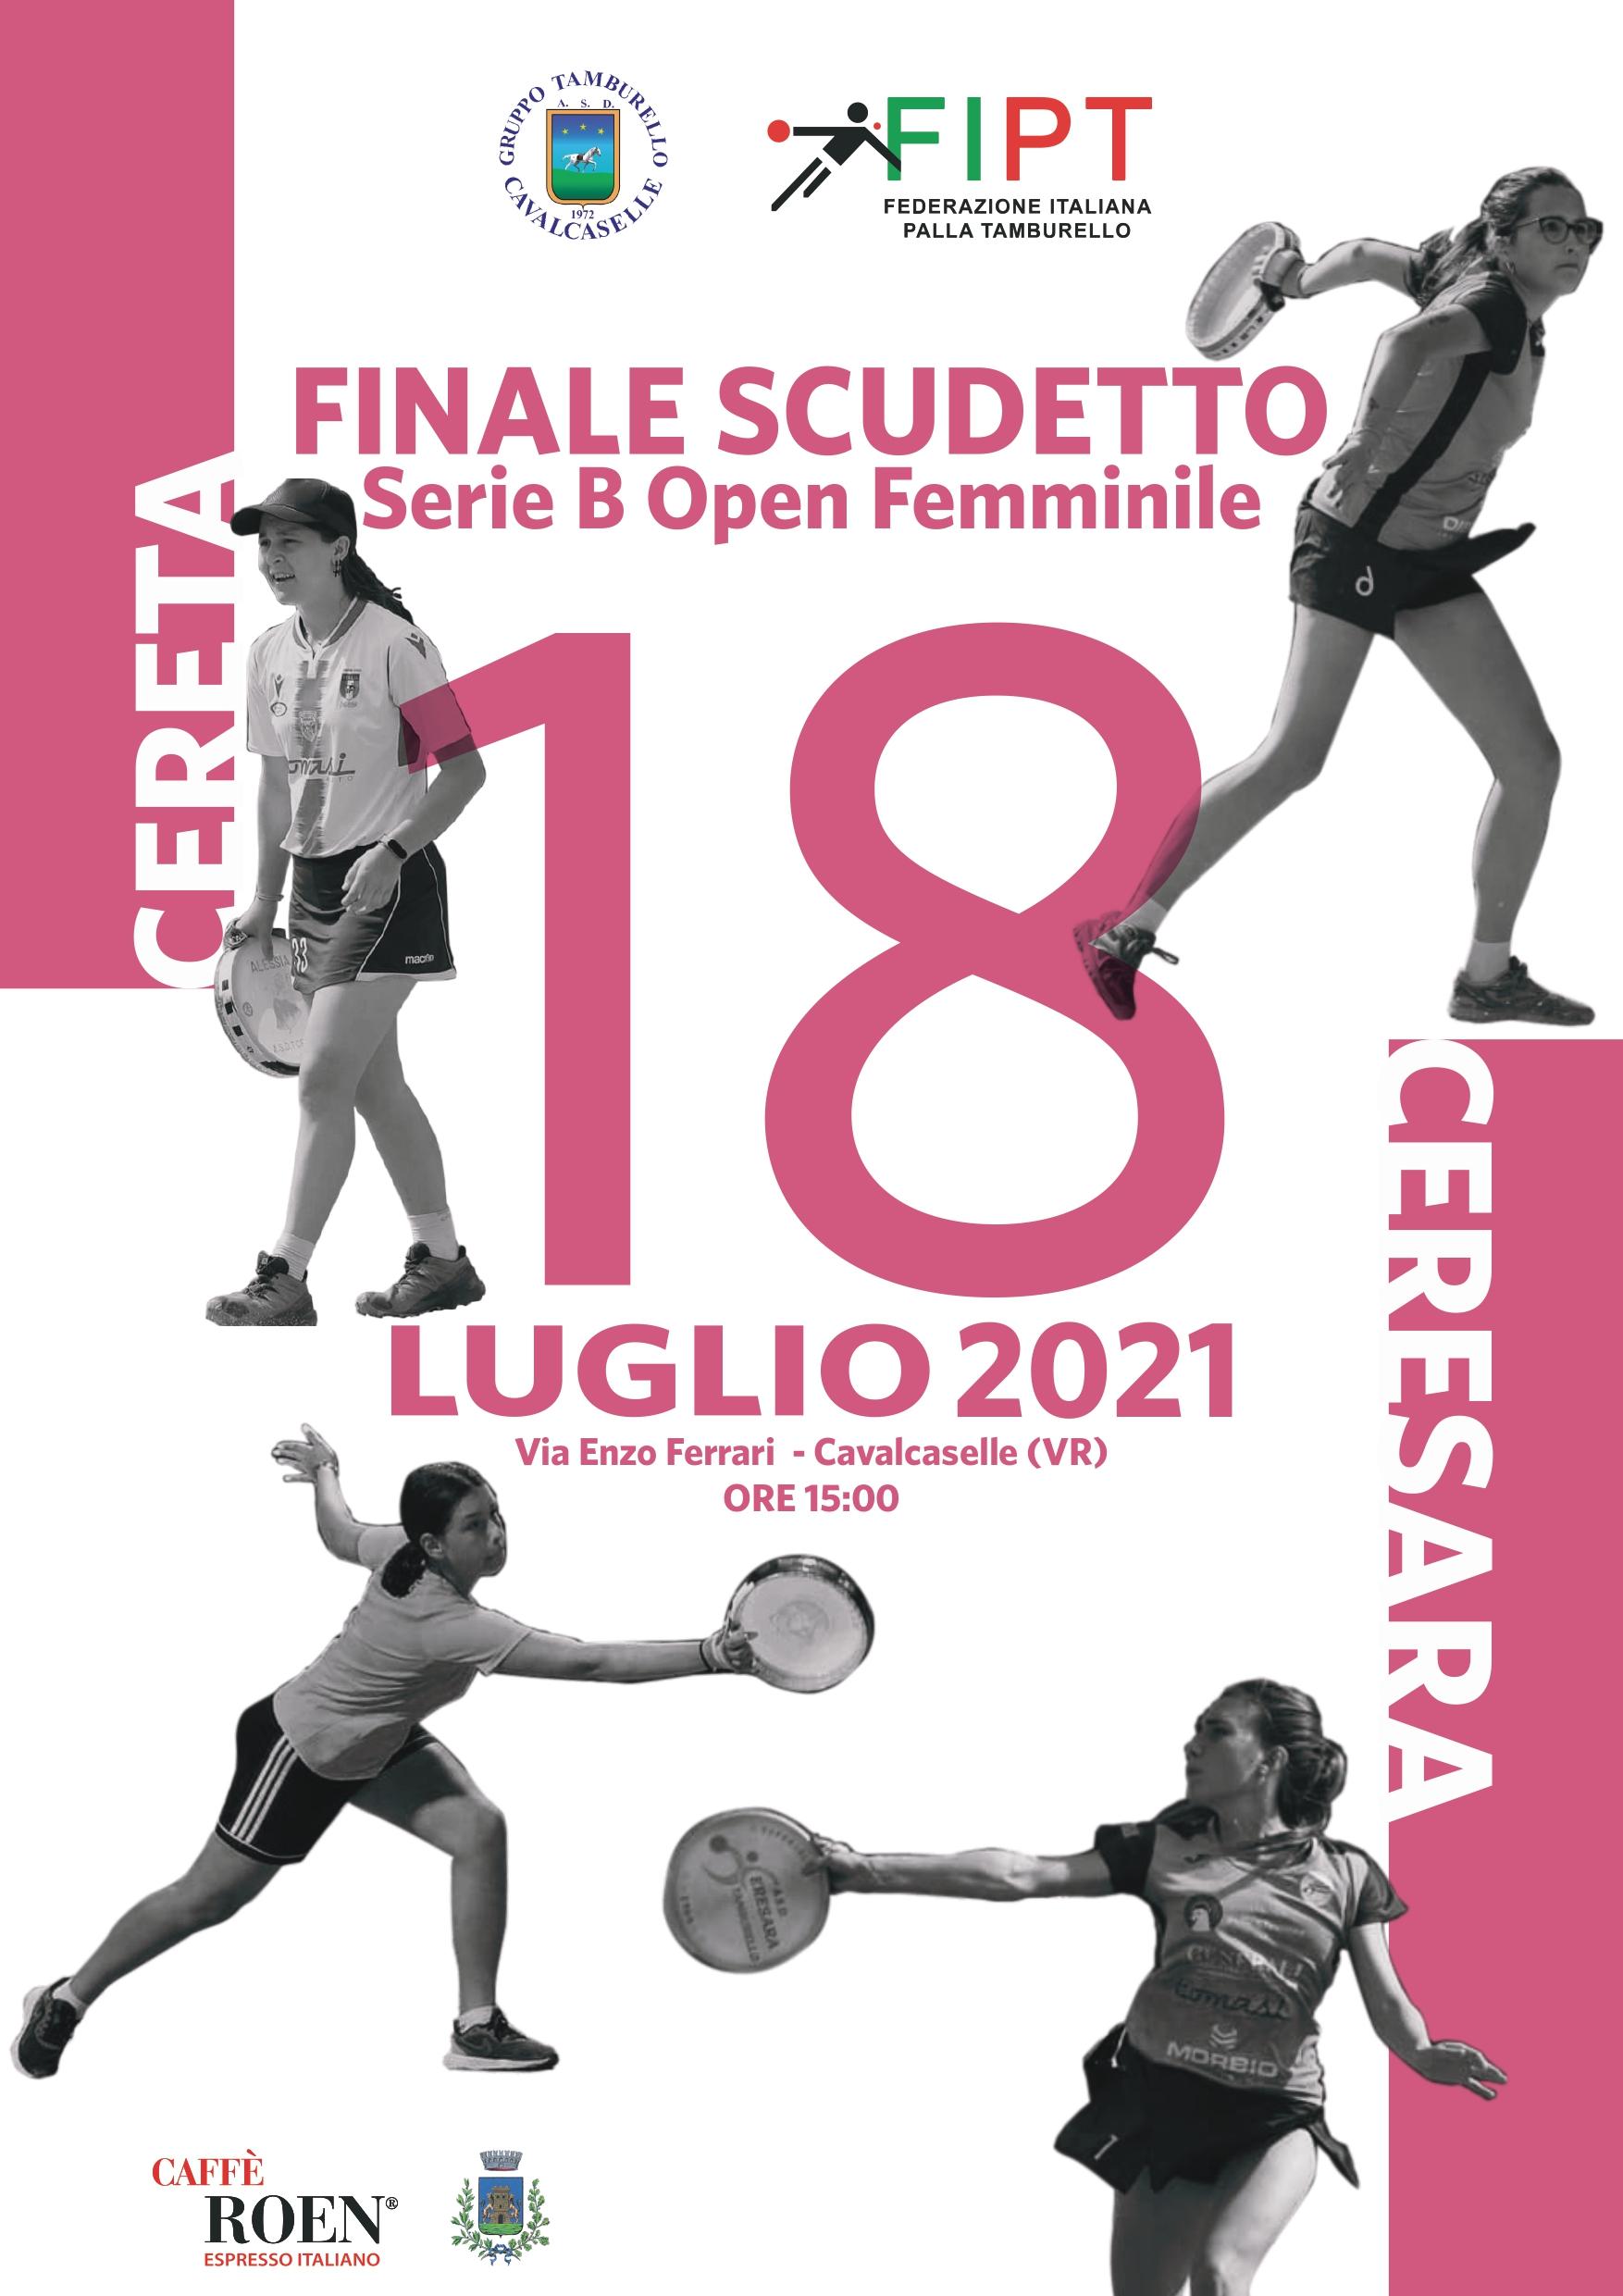 Locandina Serie B finali Femminili 2021 page 0001